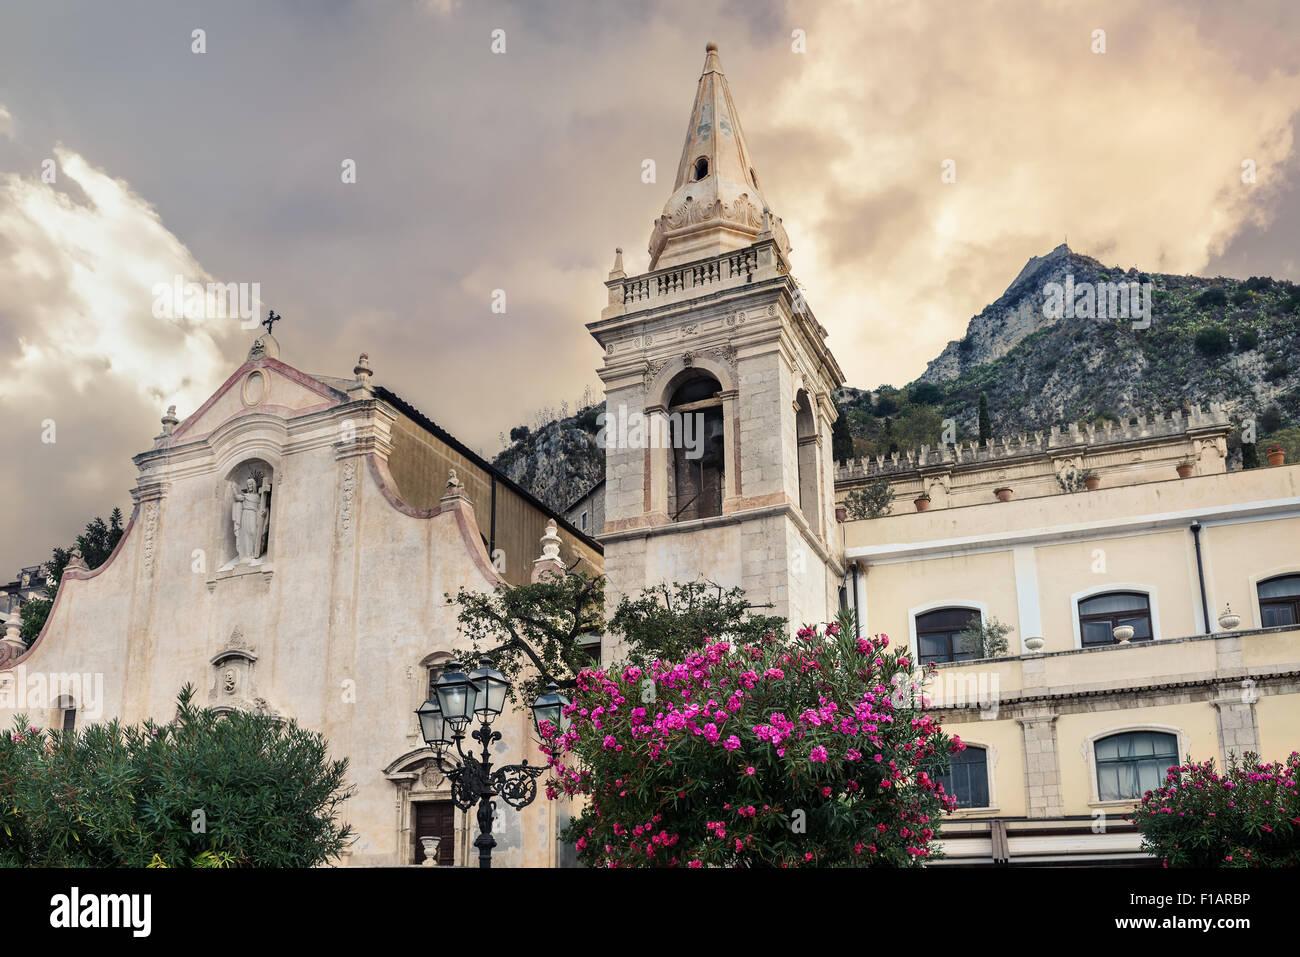 San Giuseppe Church in Taormina. Sicily, Italy - Stock Image